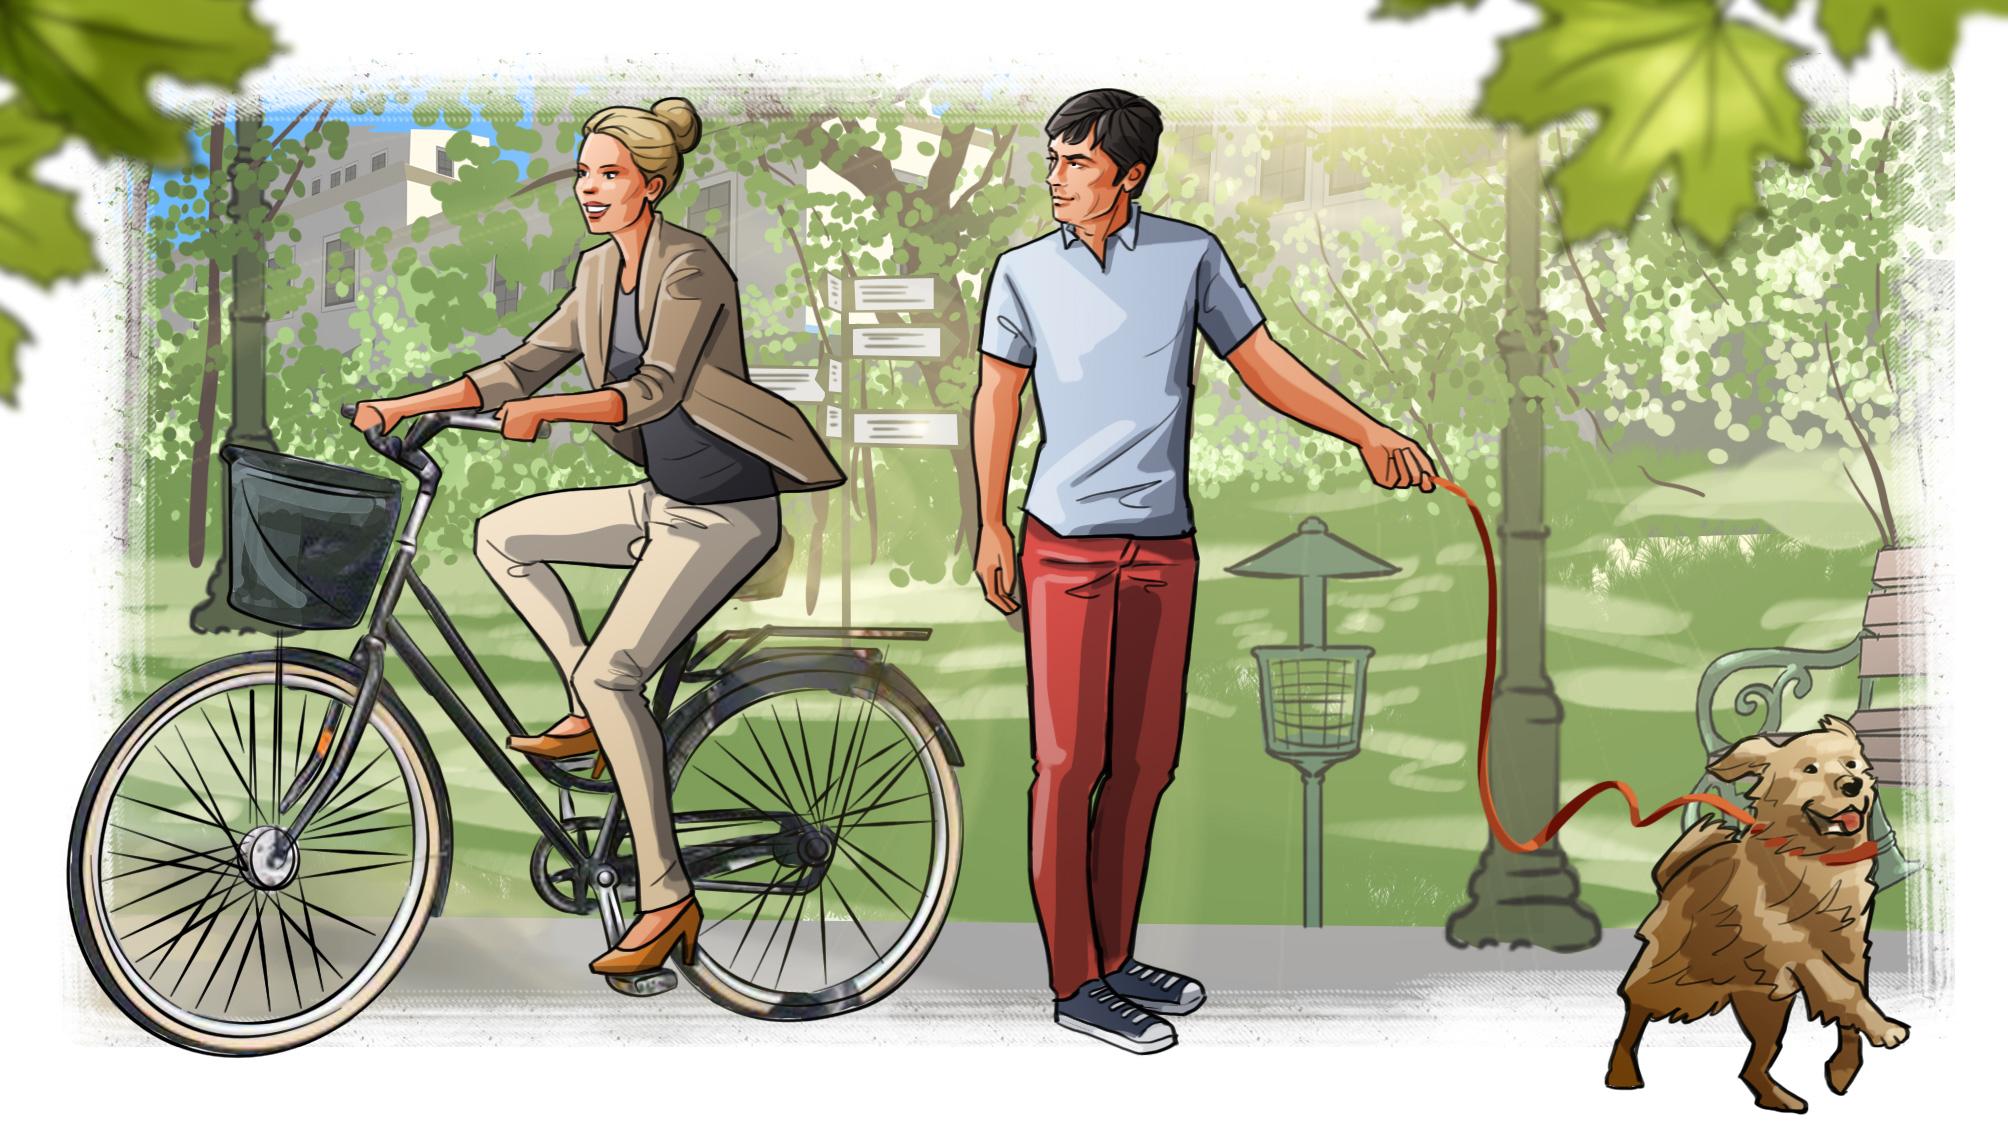 illustration-walk dog bike woman man